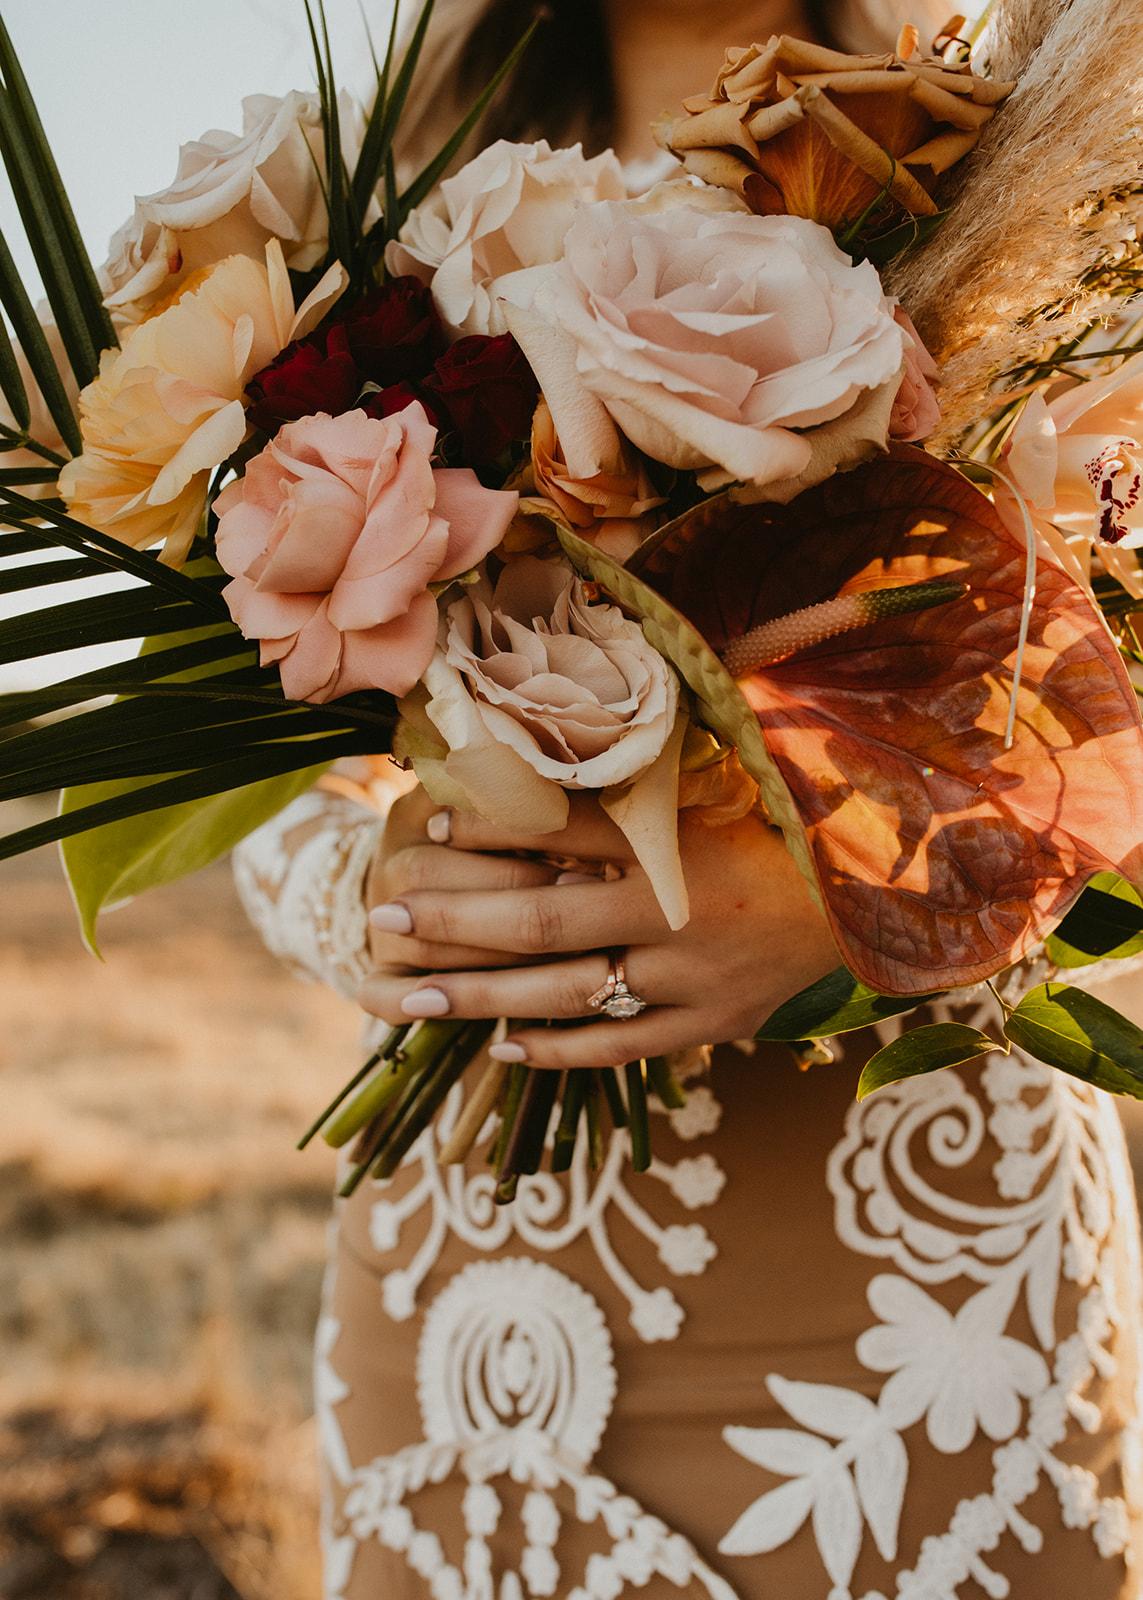 bridal bouquet + diamond ring + jewelry + boho, tropical, colorful bride bouquet + prospect house wedding + wedding planner epoch co